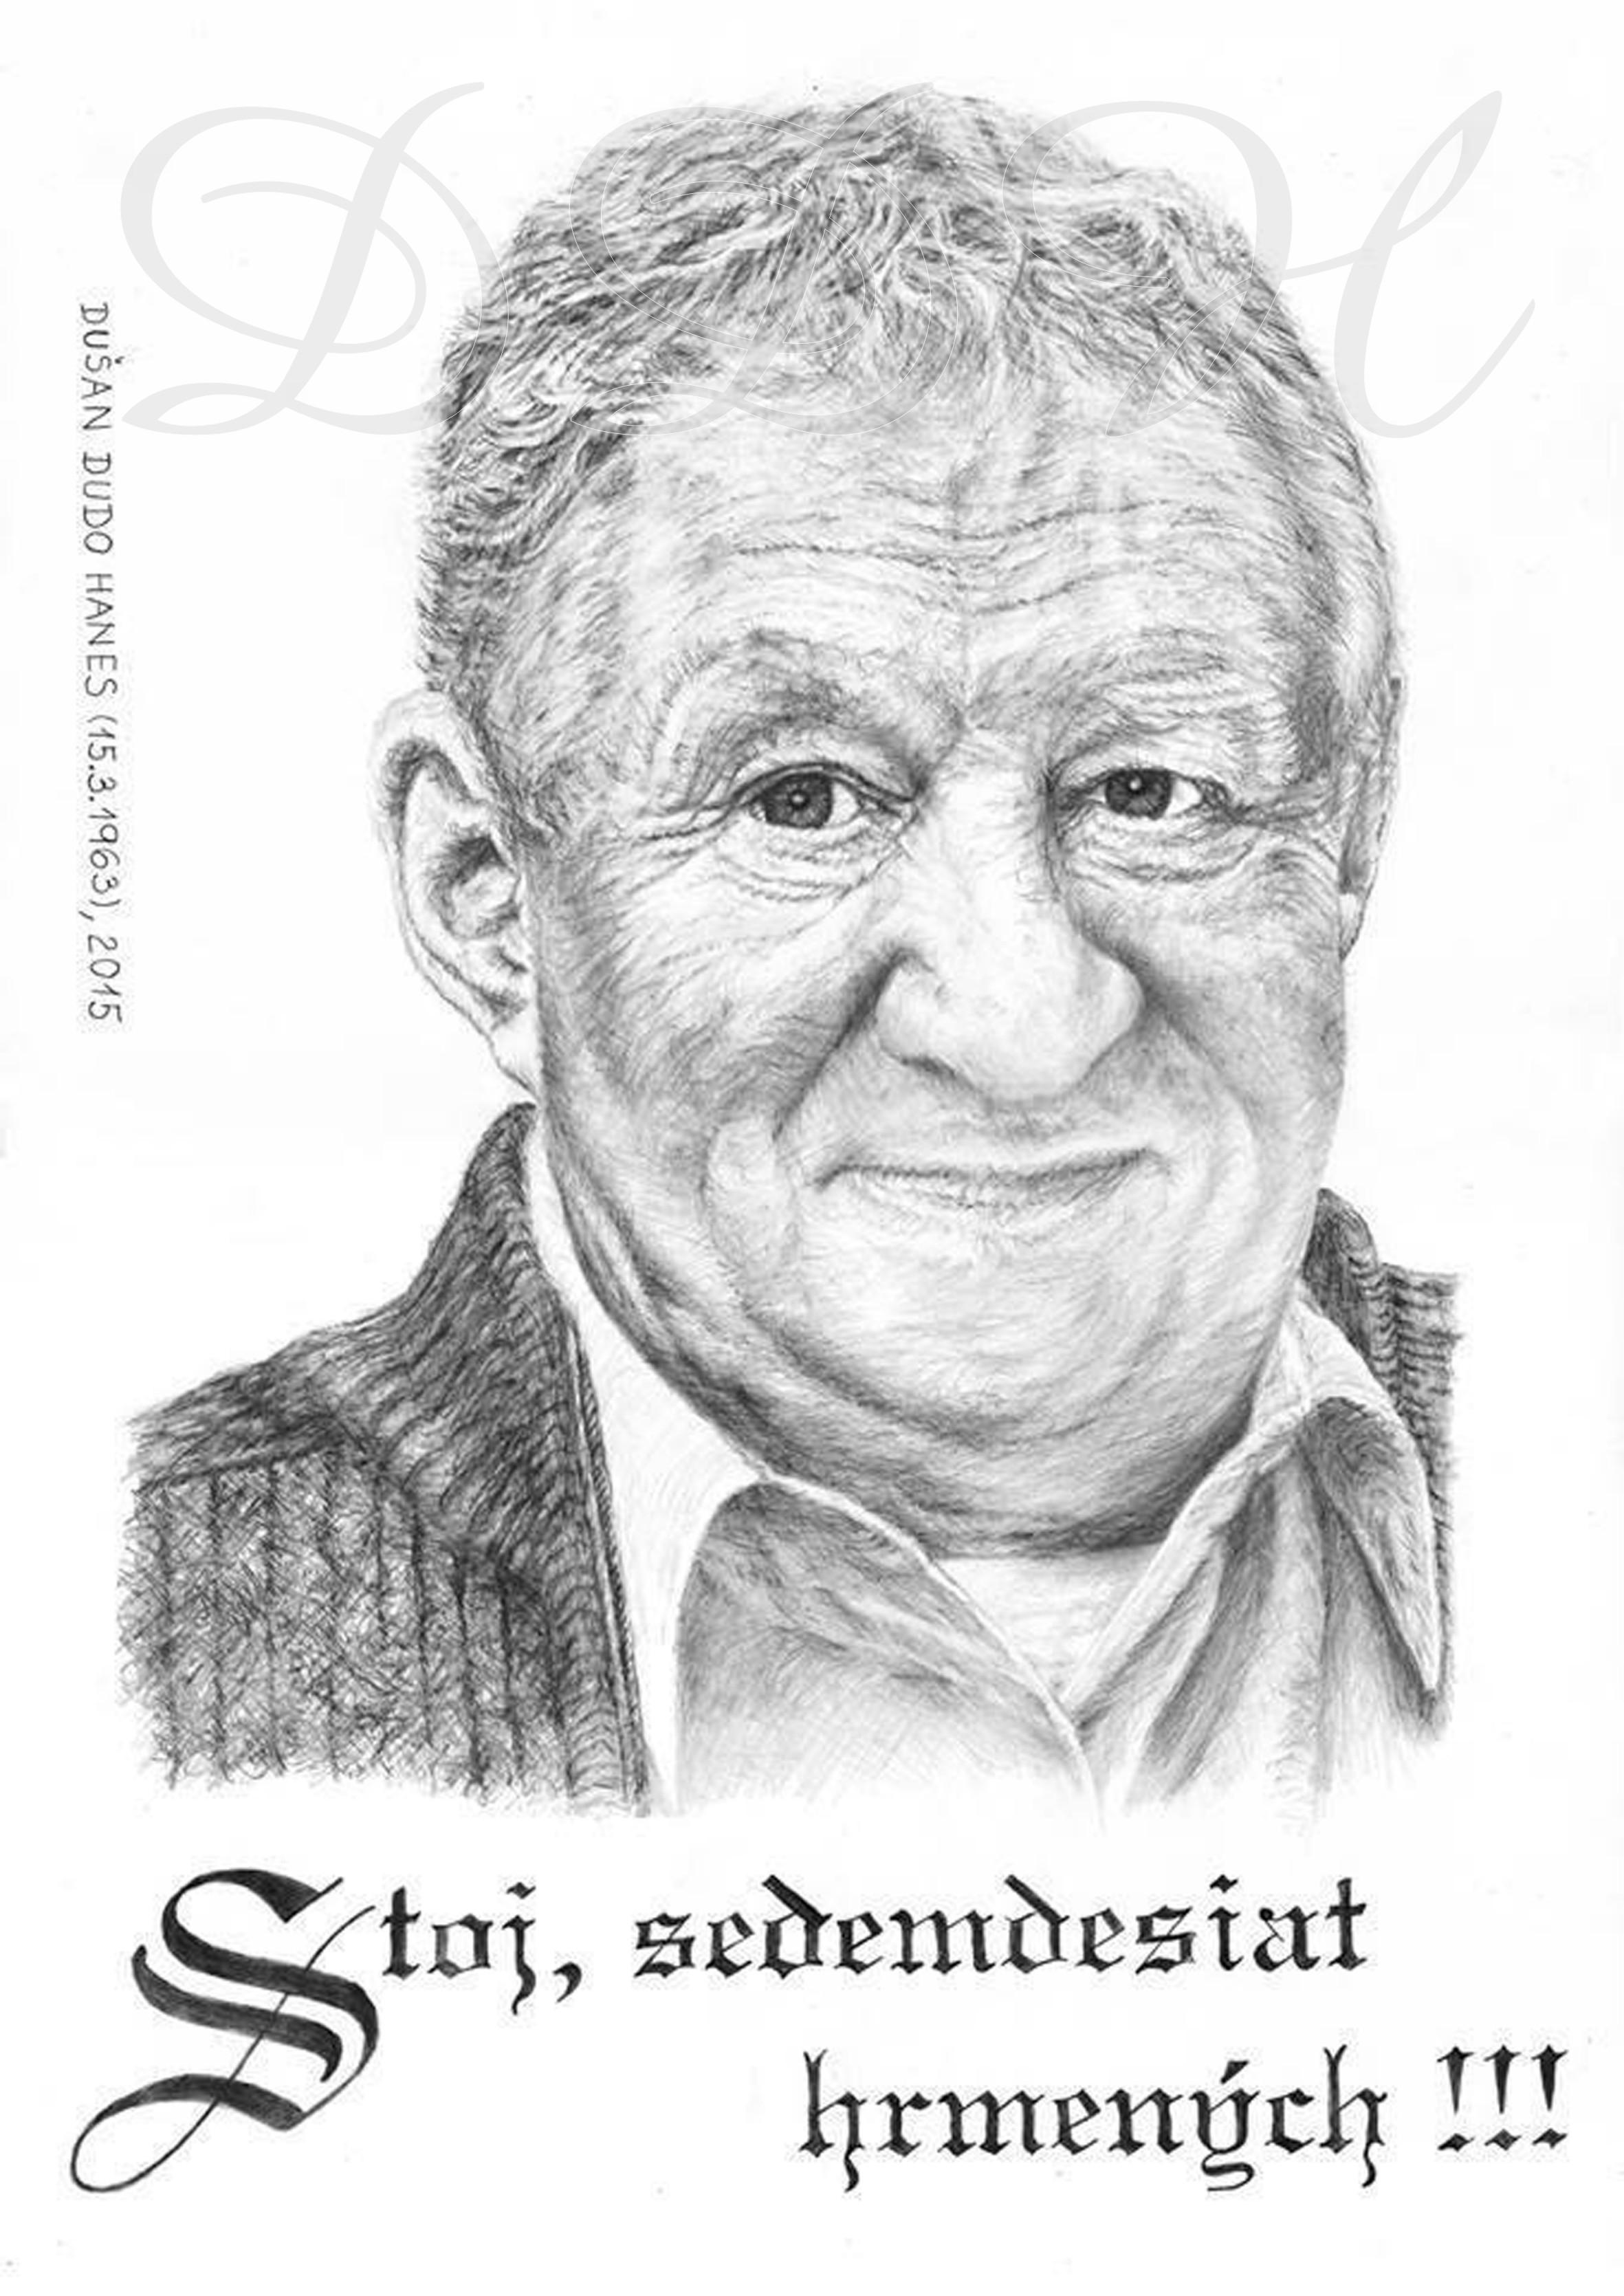 134 - Karol Čálik, portrét Dušan Dudo Hanes - dar k významnému životnému jubileu